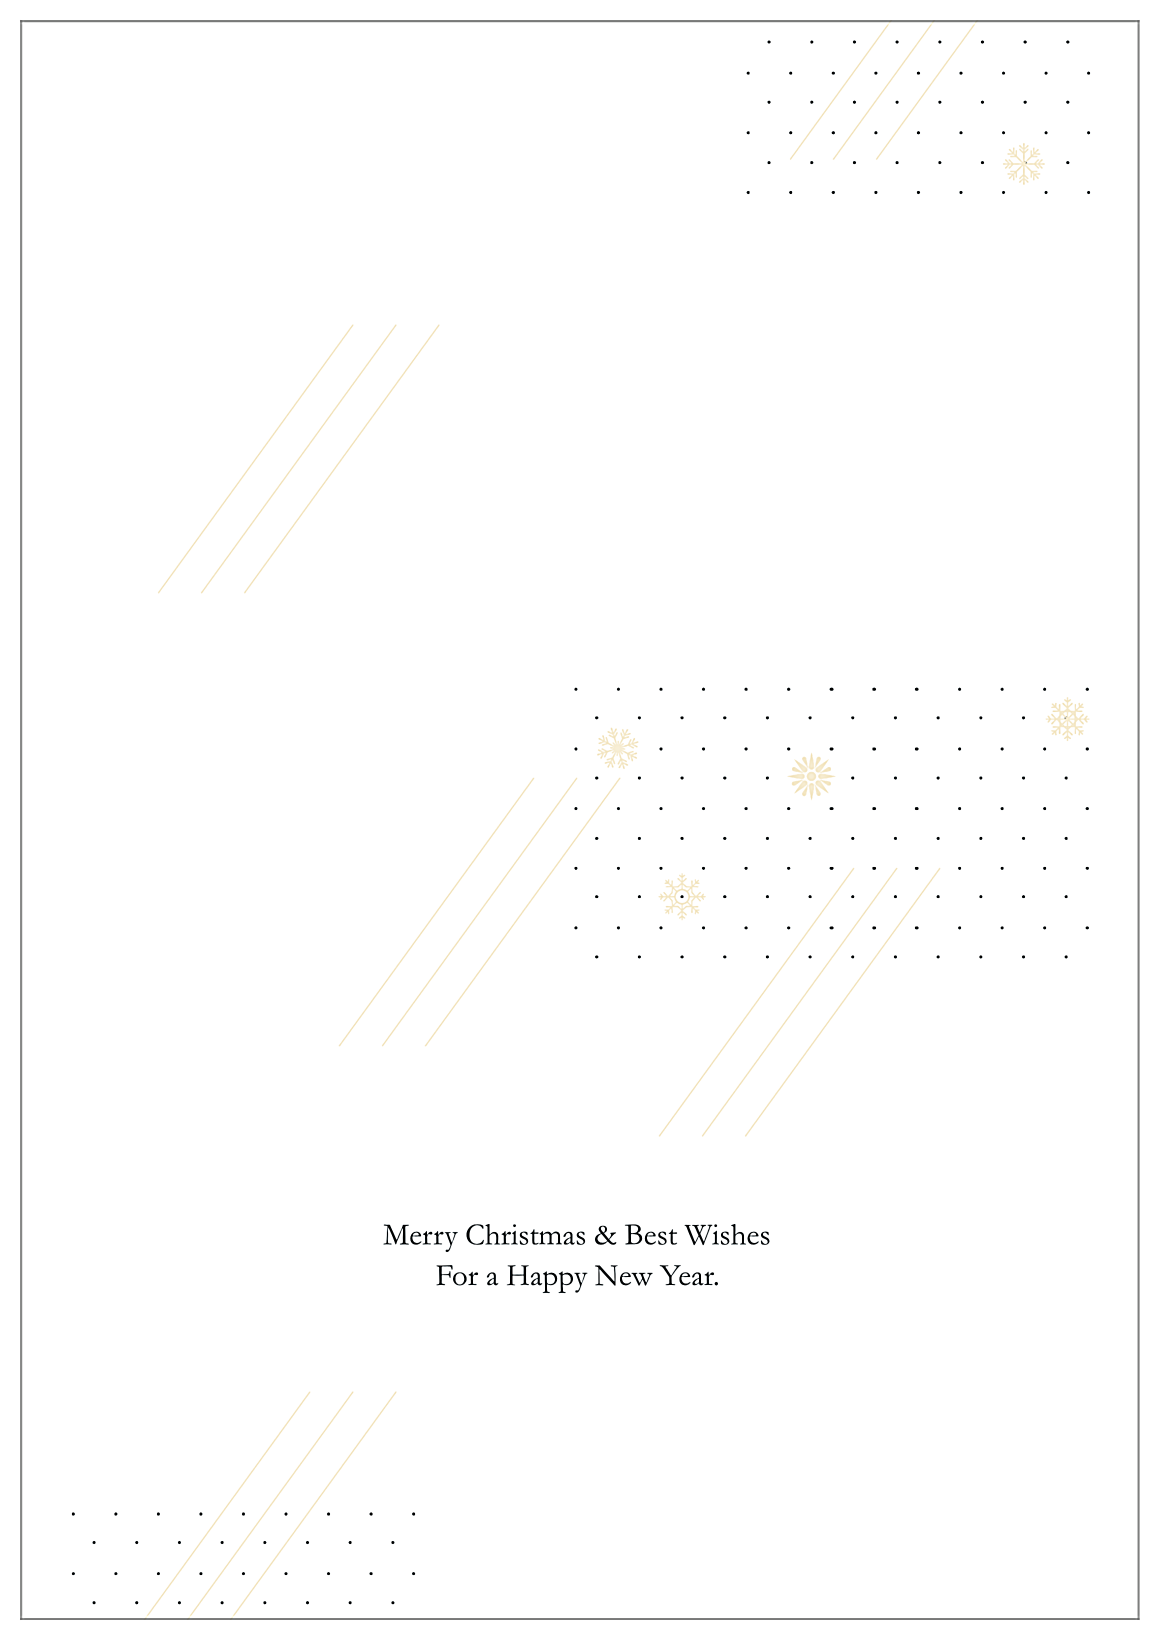 Snowflake Joy back - Greeting Cards Maker